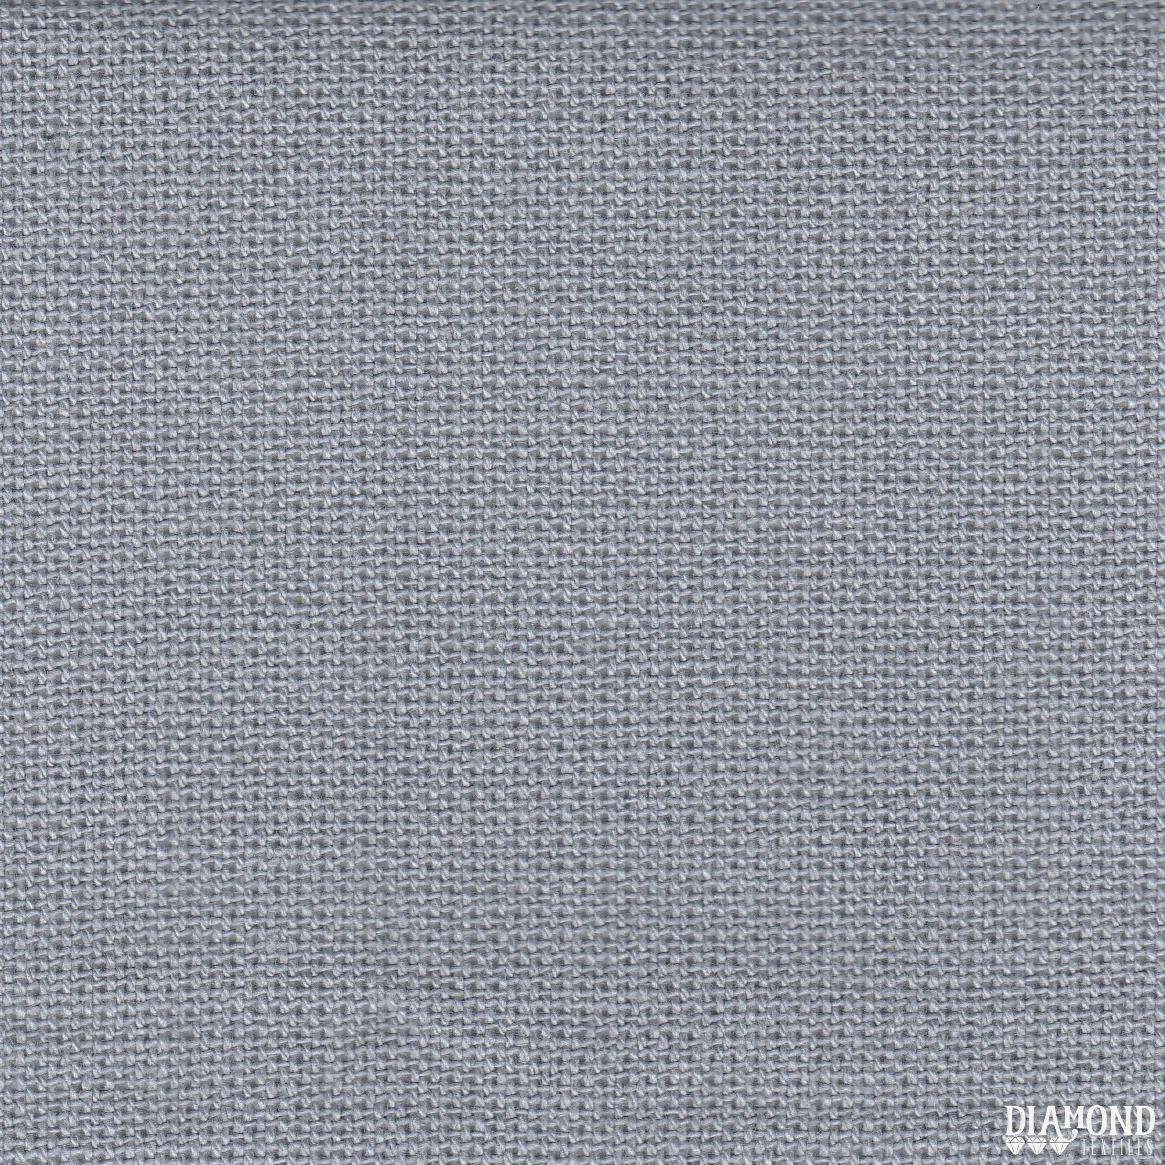 Manchester 3172 - Woven Cotton